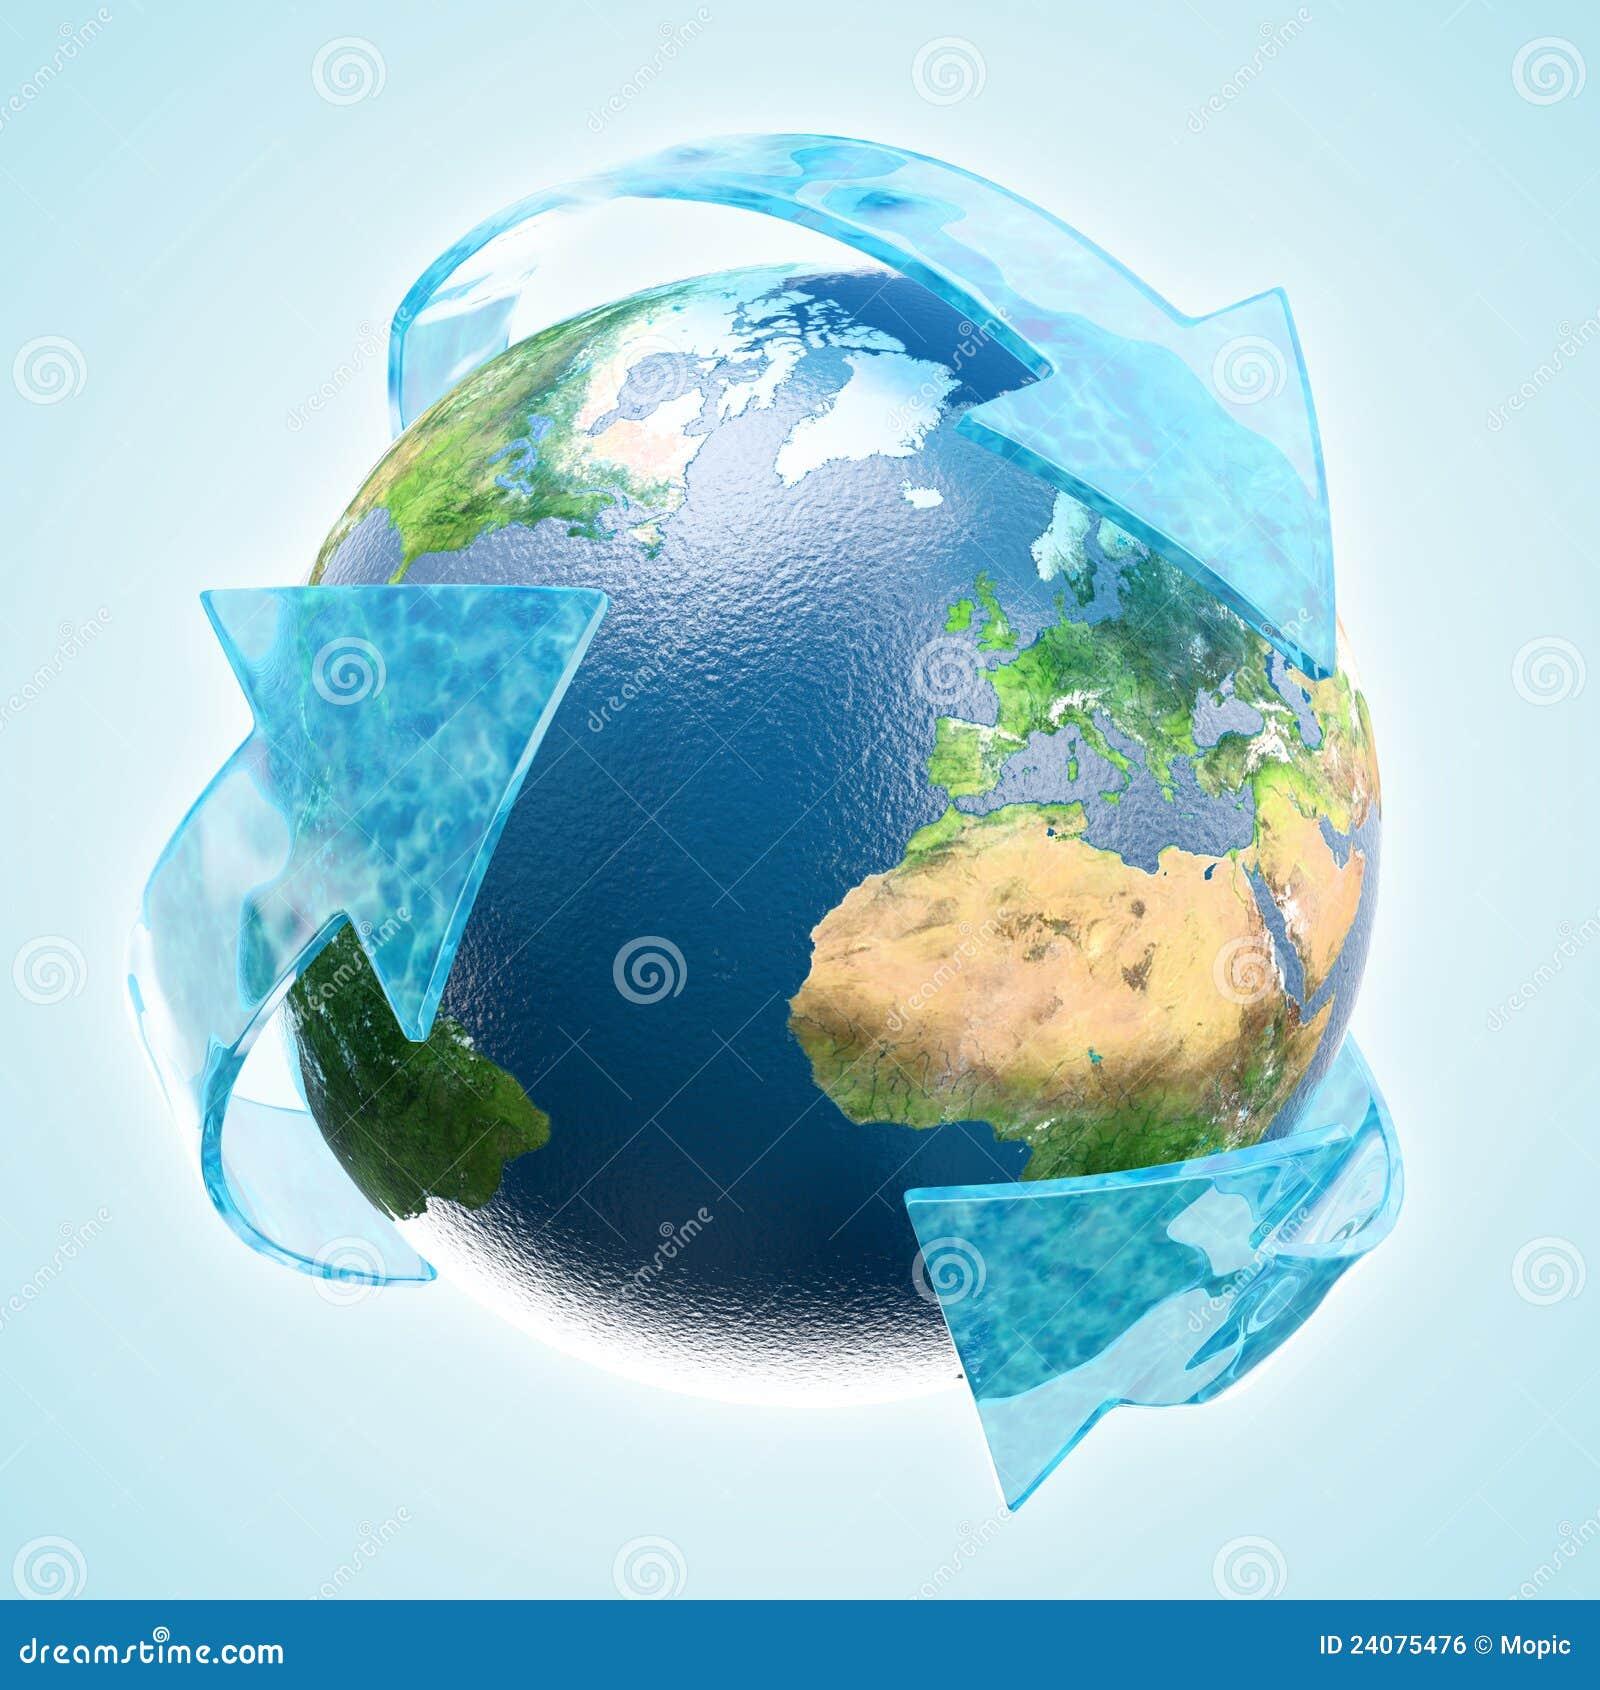 renewable energy business plan